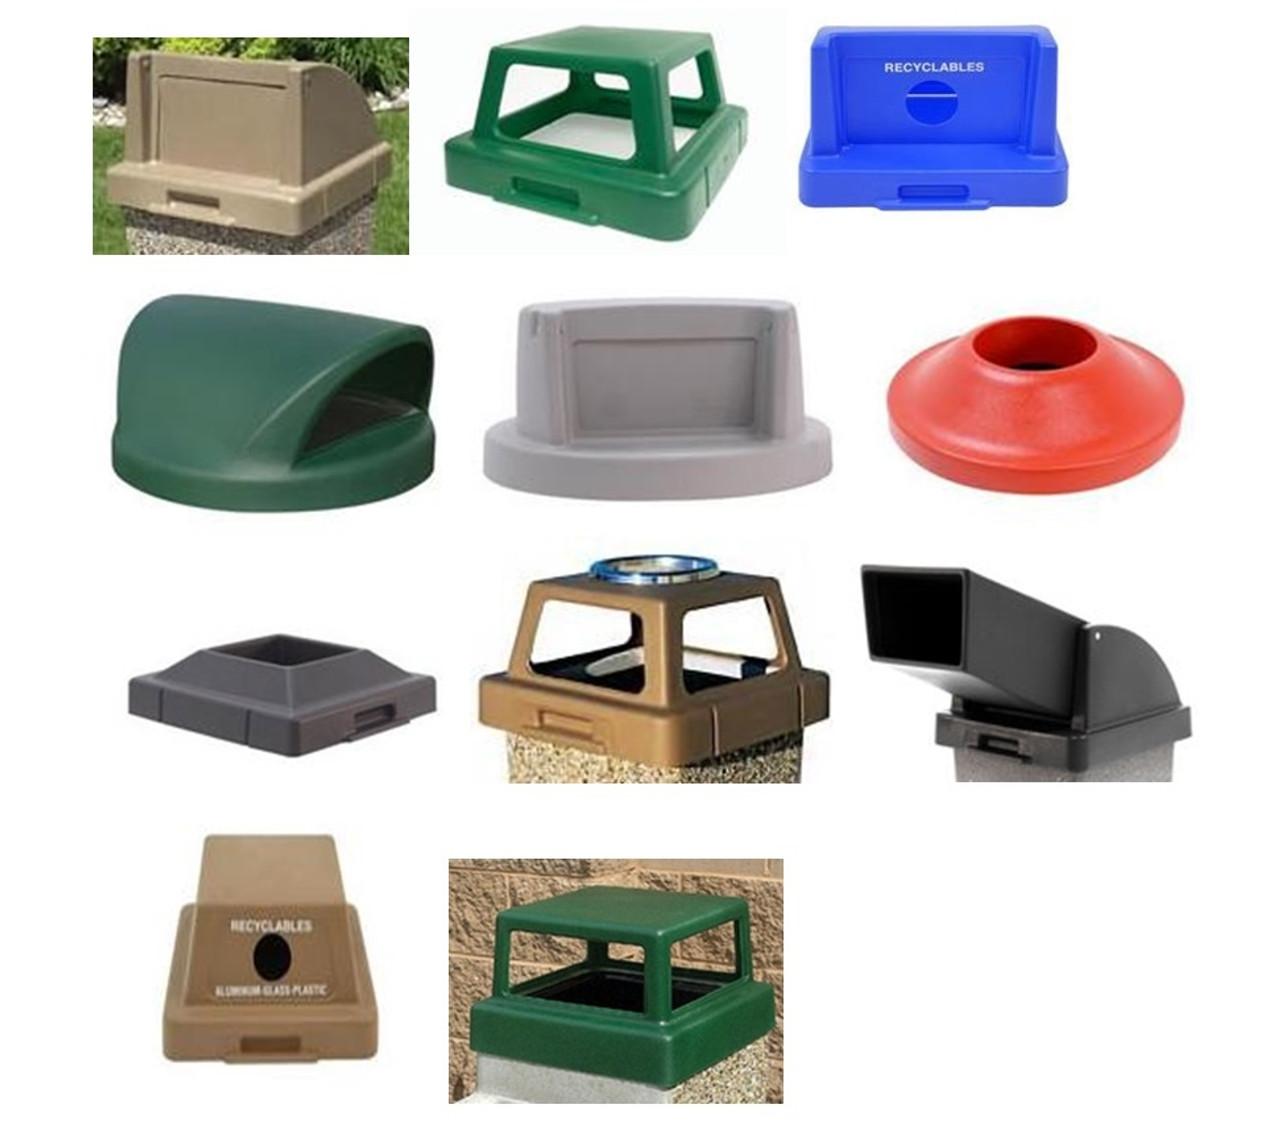 30 Gallon and 53 Gallon Plastic Lids Concrete Trash Cans Square & Round TFLIDS